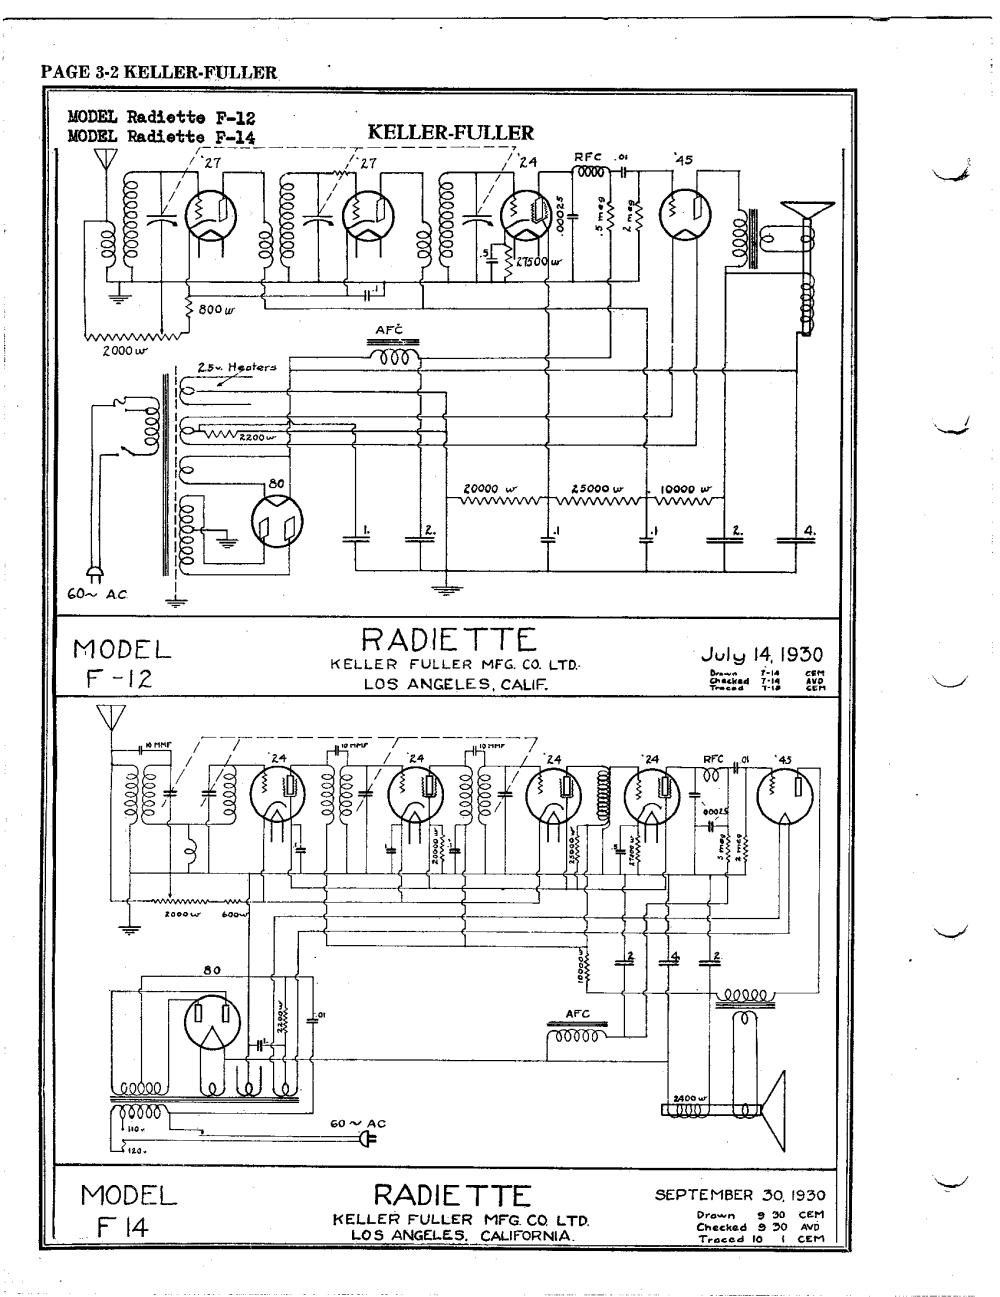 medium resolution of keller fuller radiette f 14 schematic